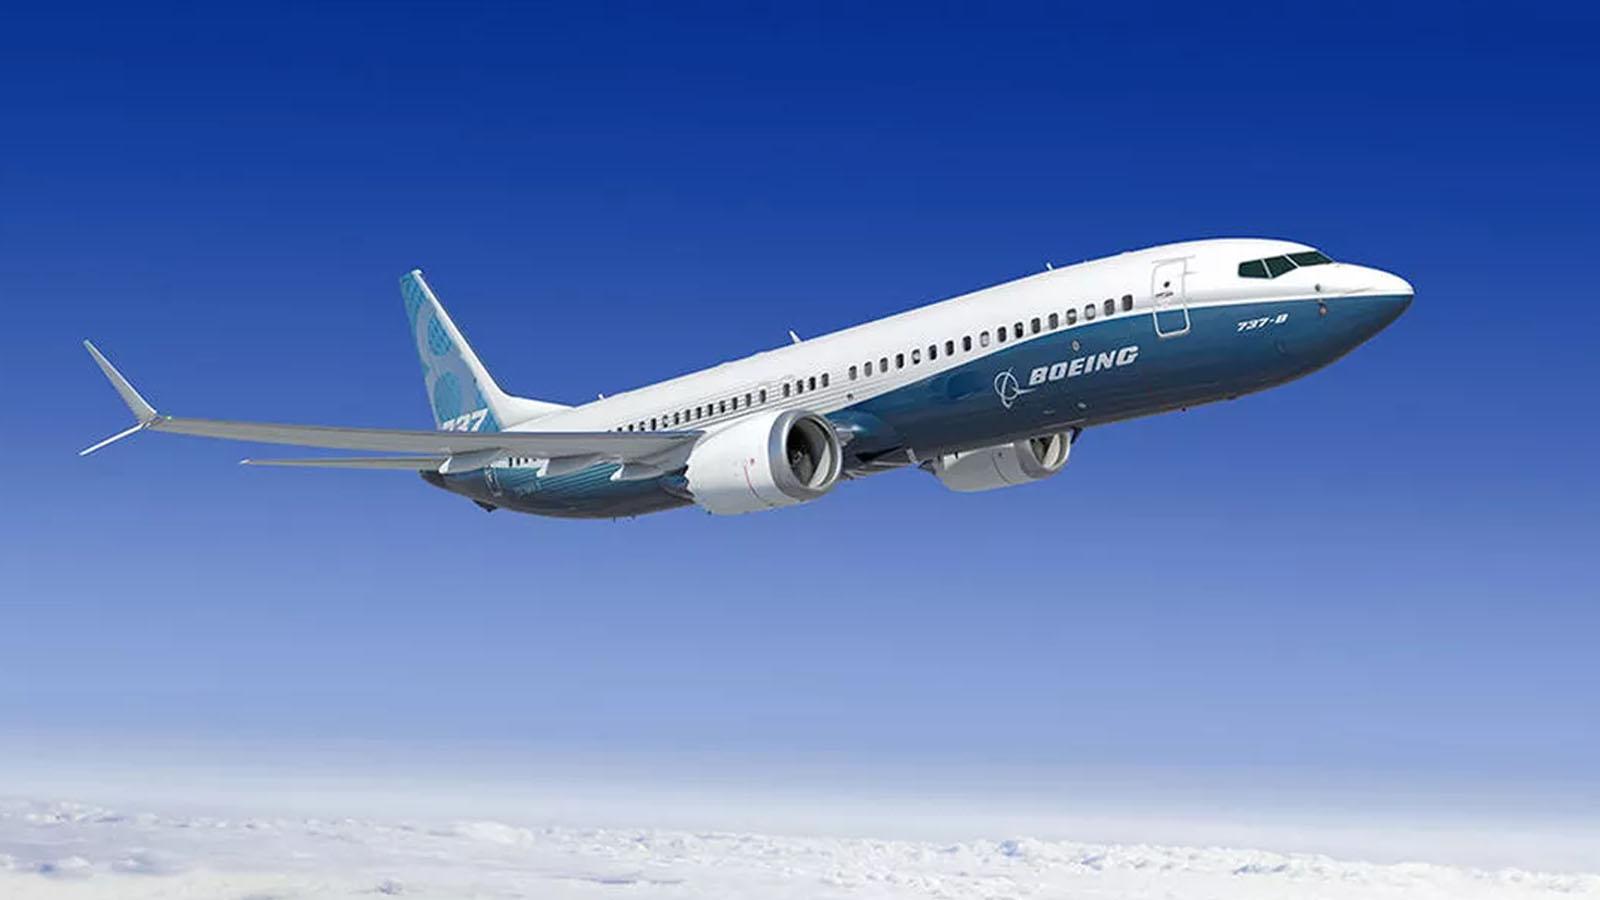 GCAA monitoring investigations surrounding Boeing 737 Max 8 aircraft